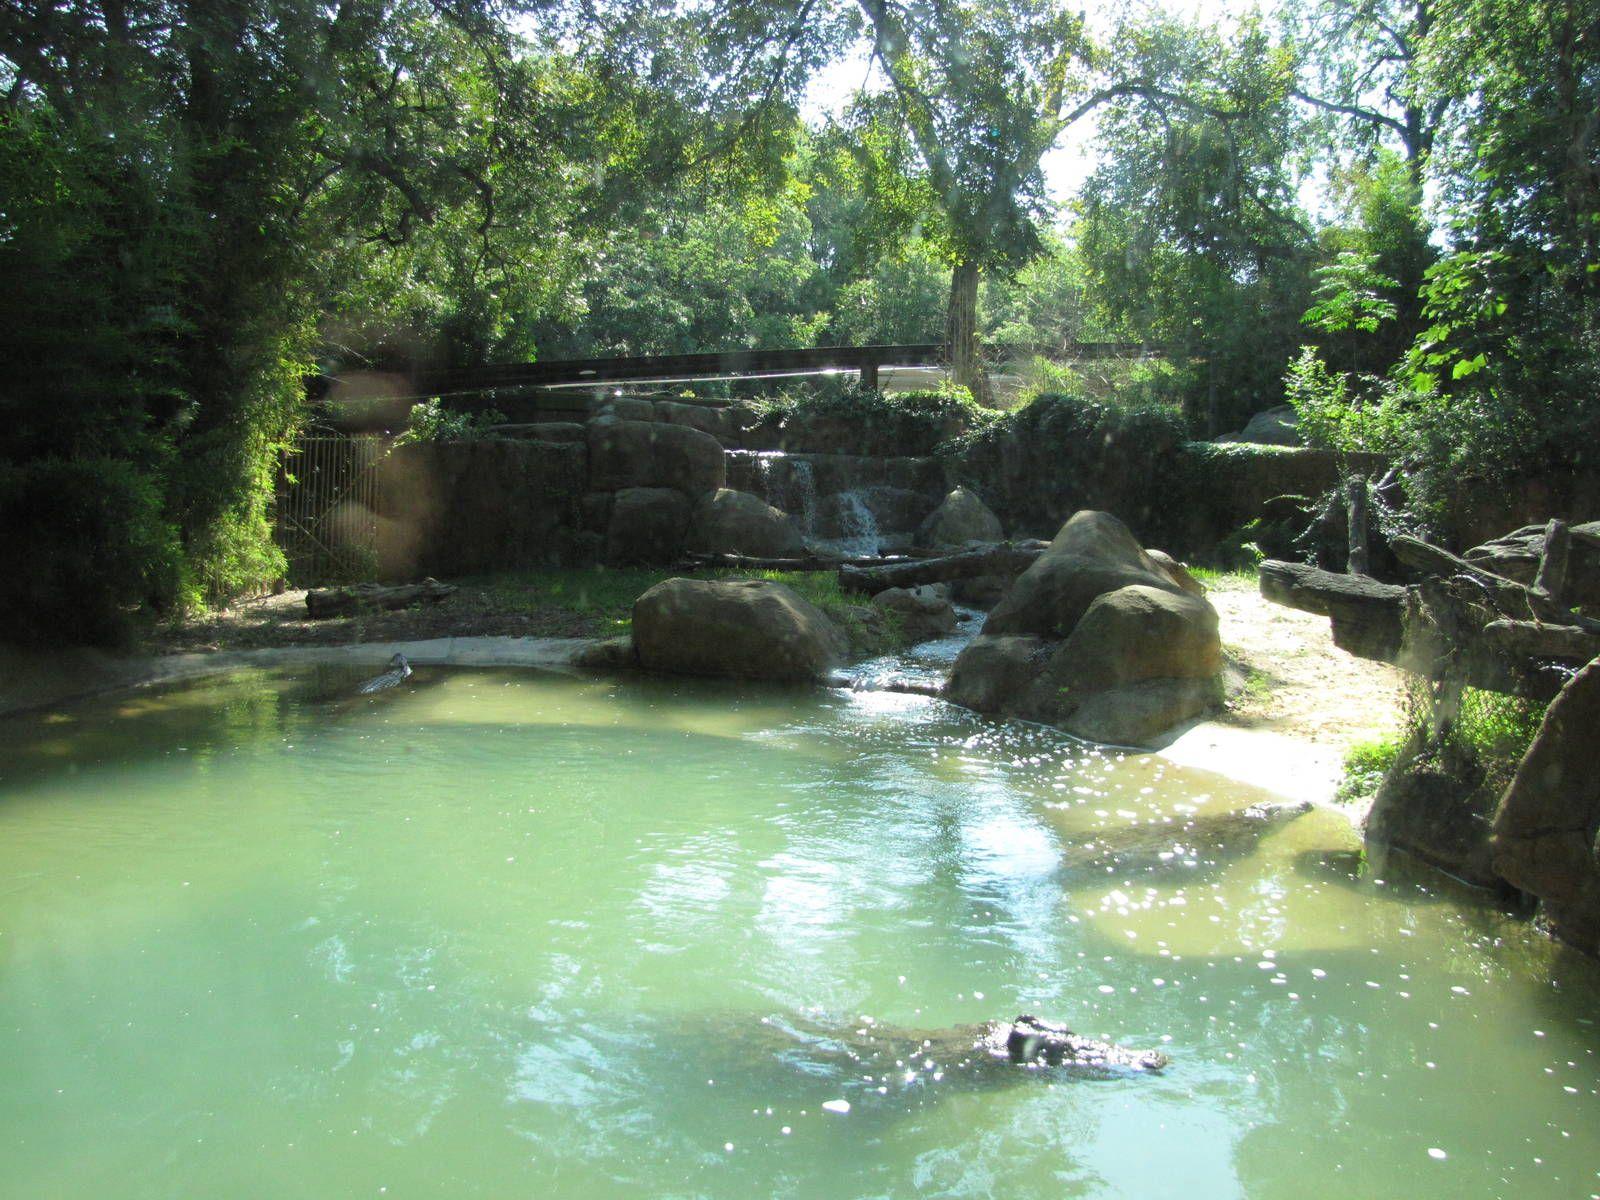 nile crocodiles in zoos